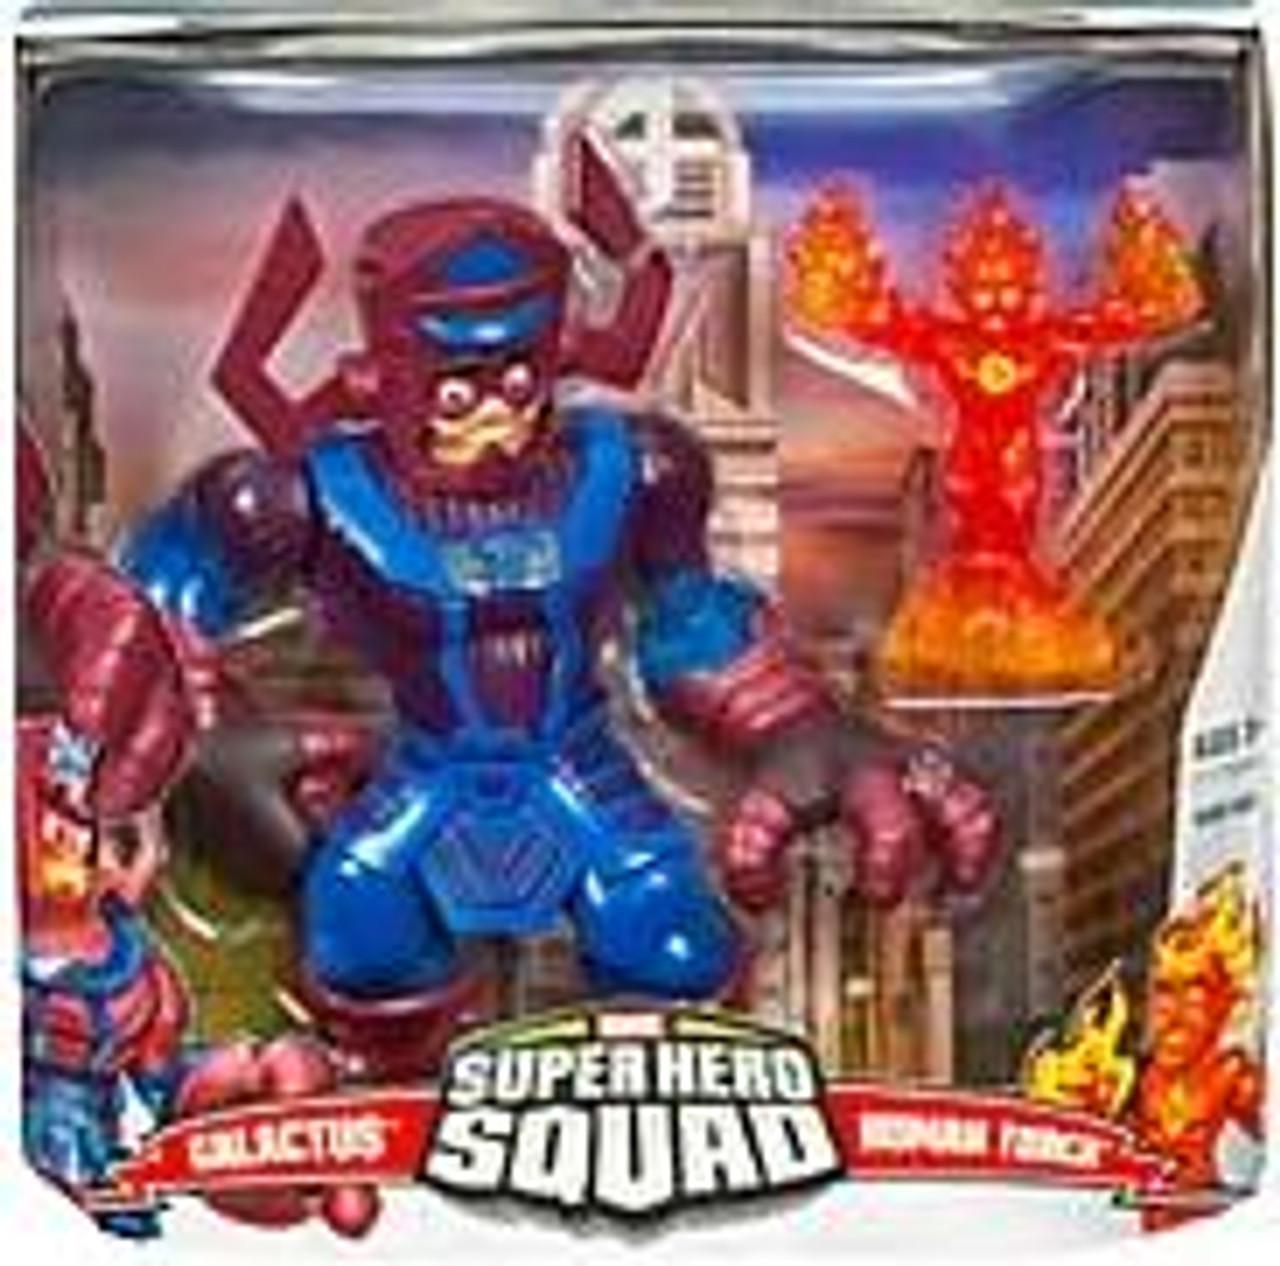 Marvel Super Hero Squad Series 1 Galactus & Human Torch Action Figure Set